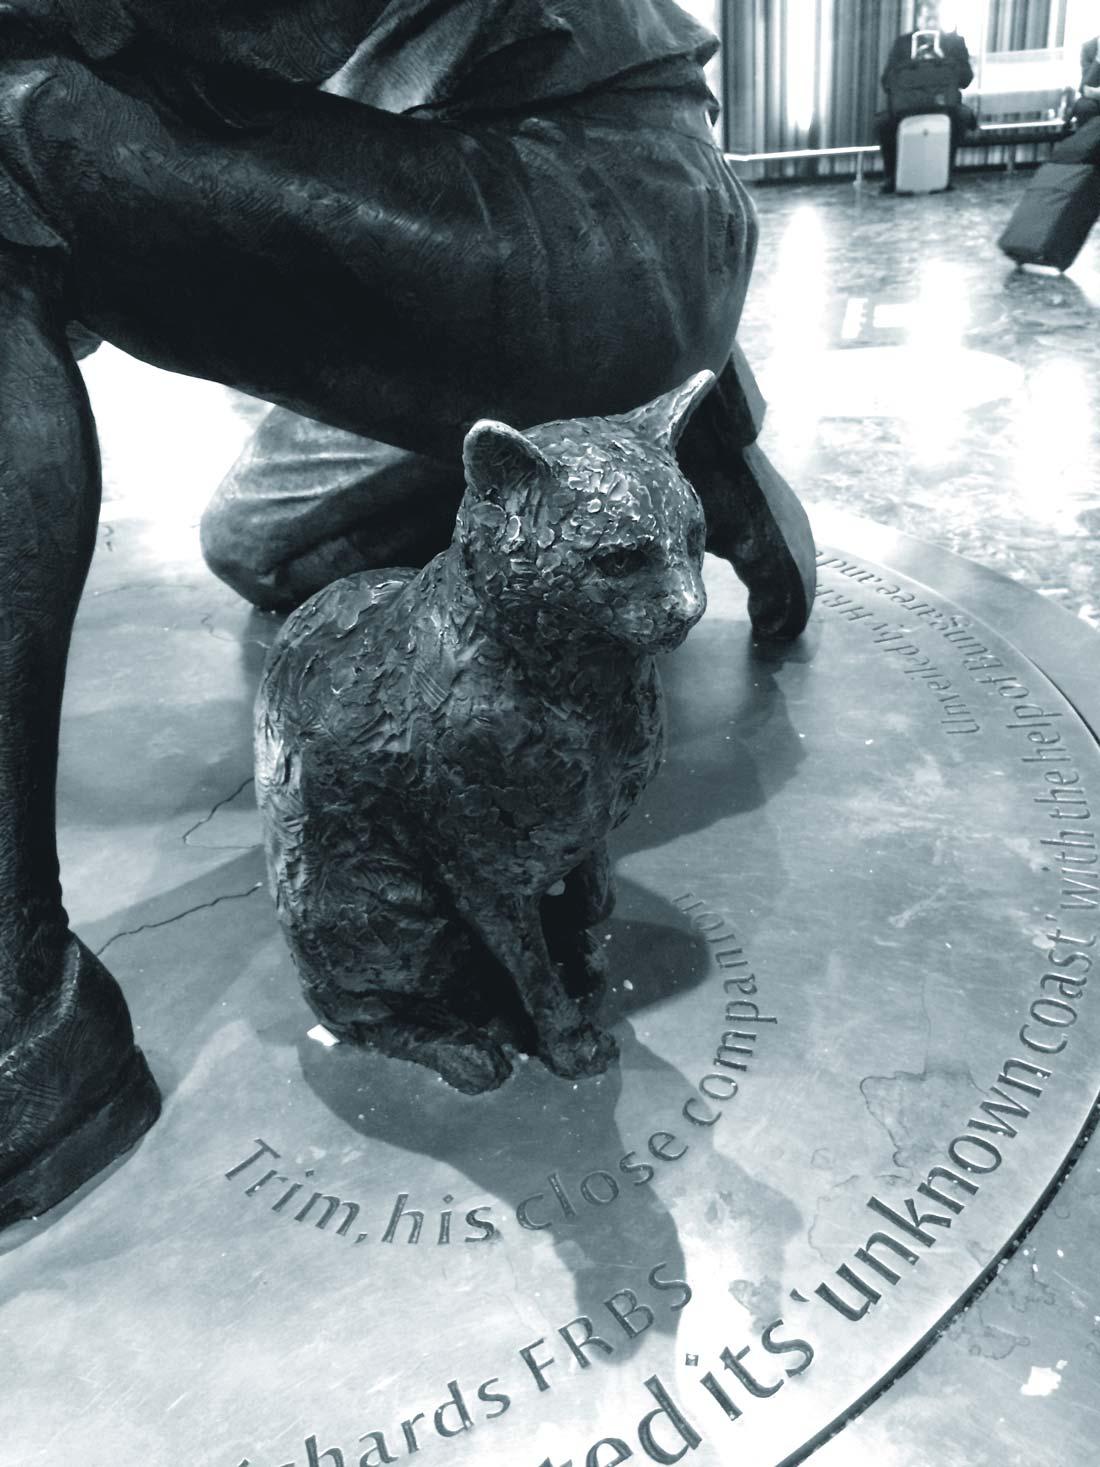 A bronze statue of Trim, a faithful and bold seafaring feline